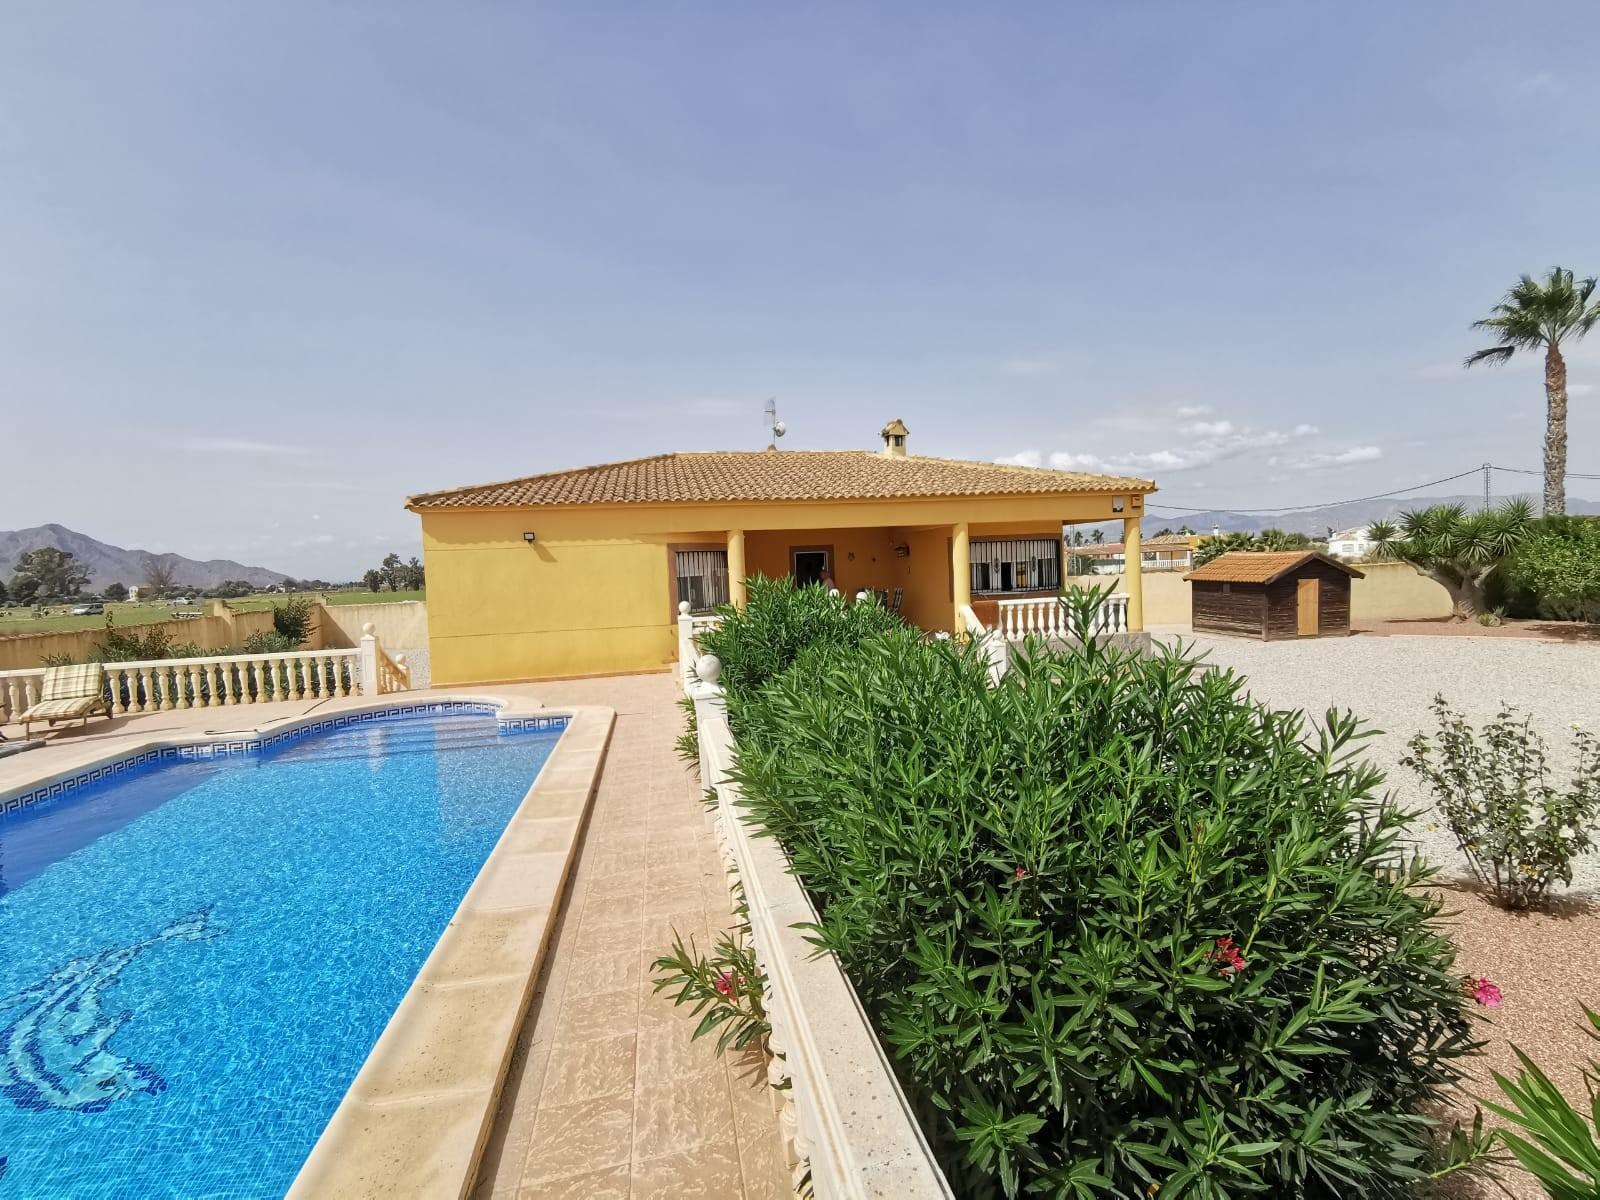 For sale: 3 bedroom finca in Catral, Costa Blanca